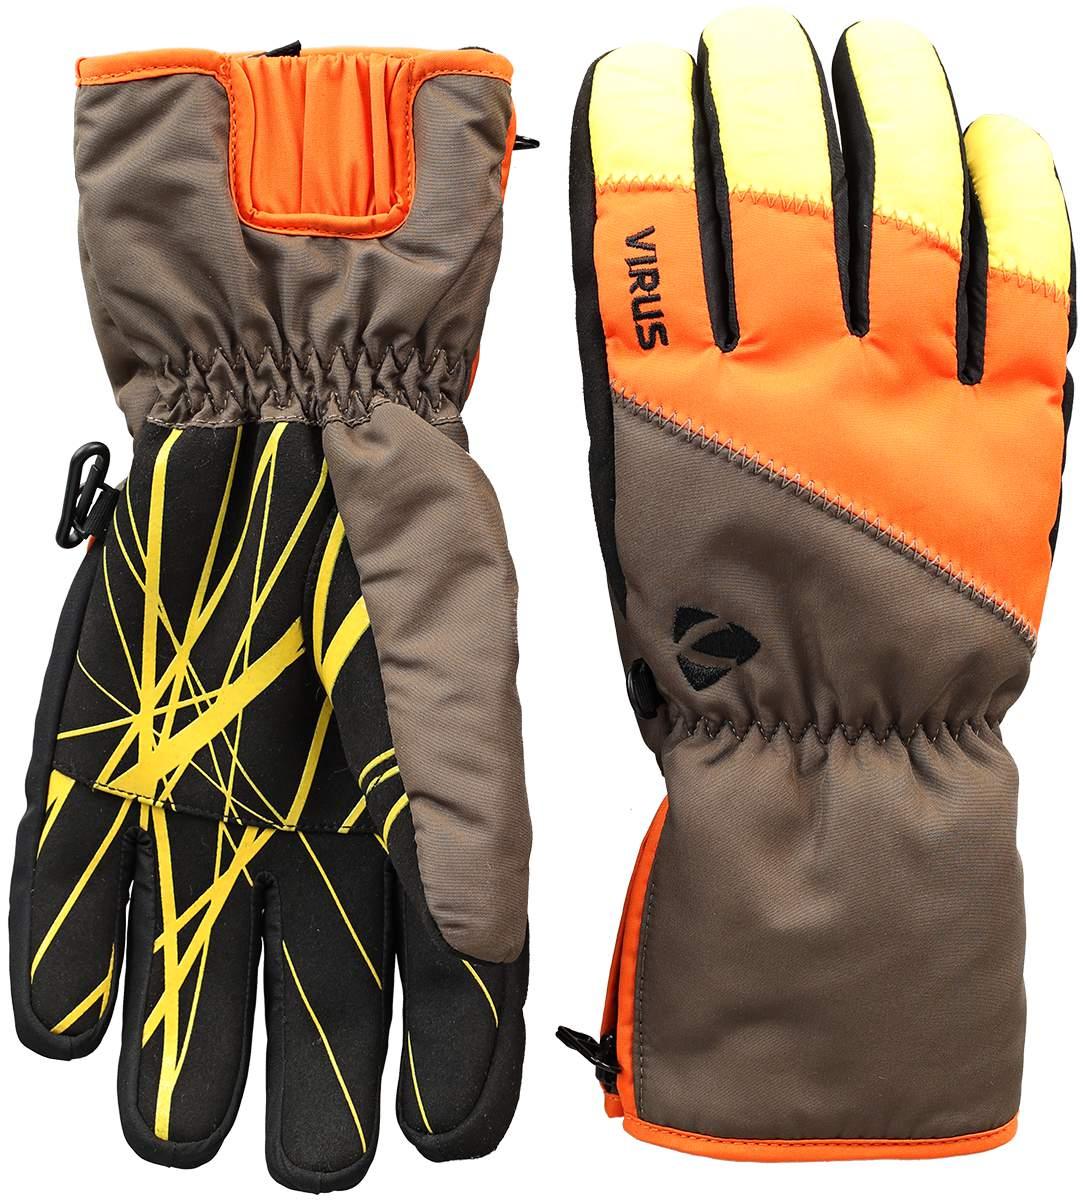 Перчатки Trail W женскиеПерчатки<br><br><br>Цвет: Апельсиновый<br>Размер: XL